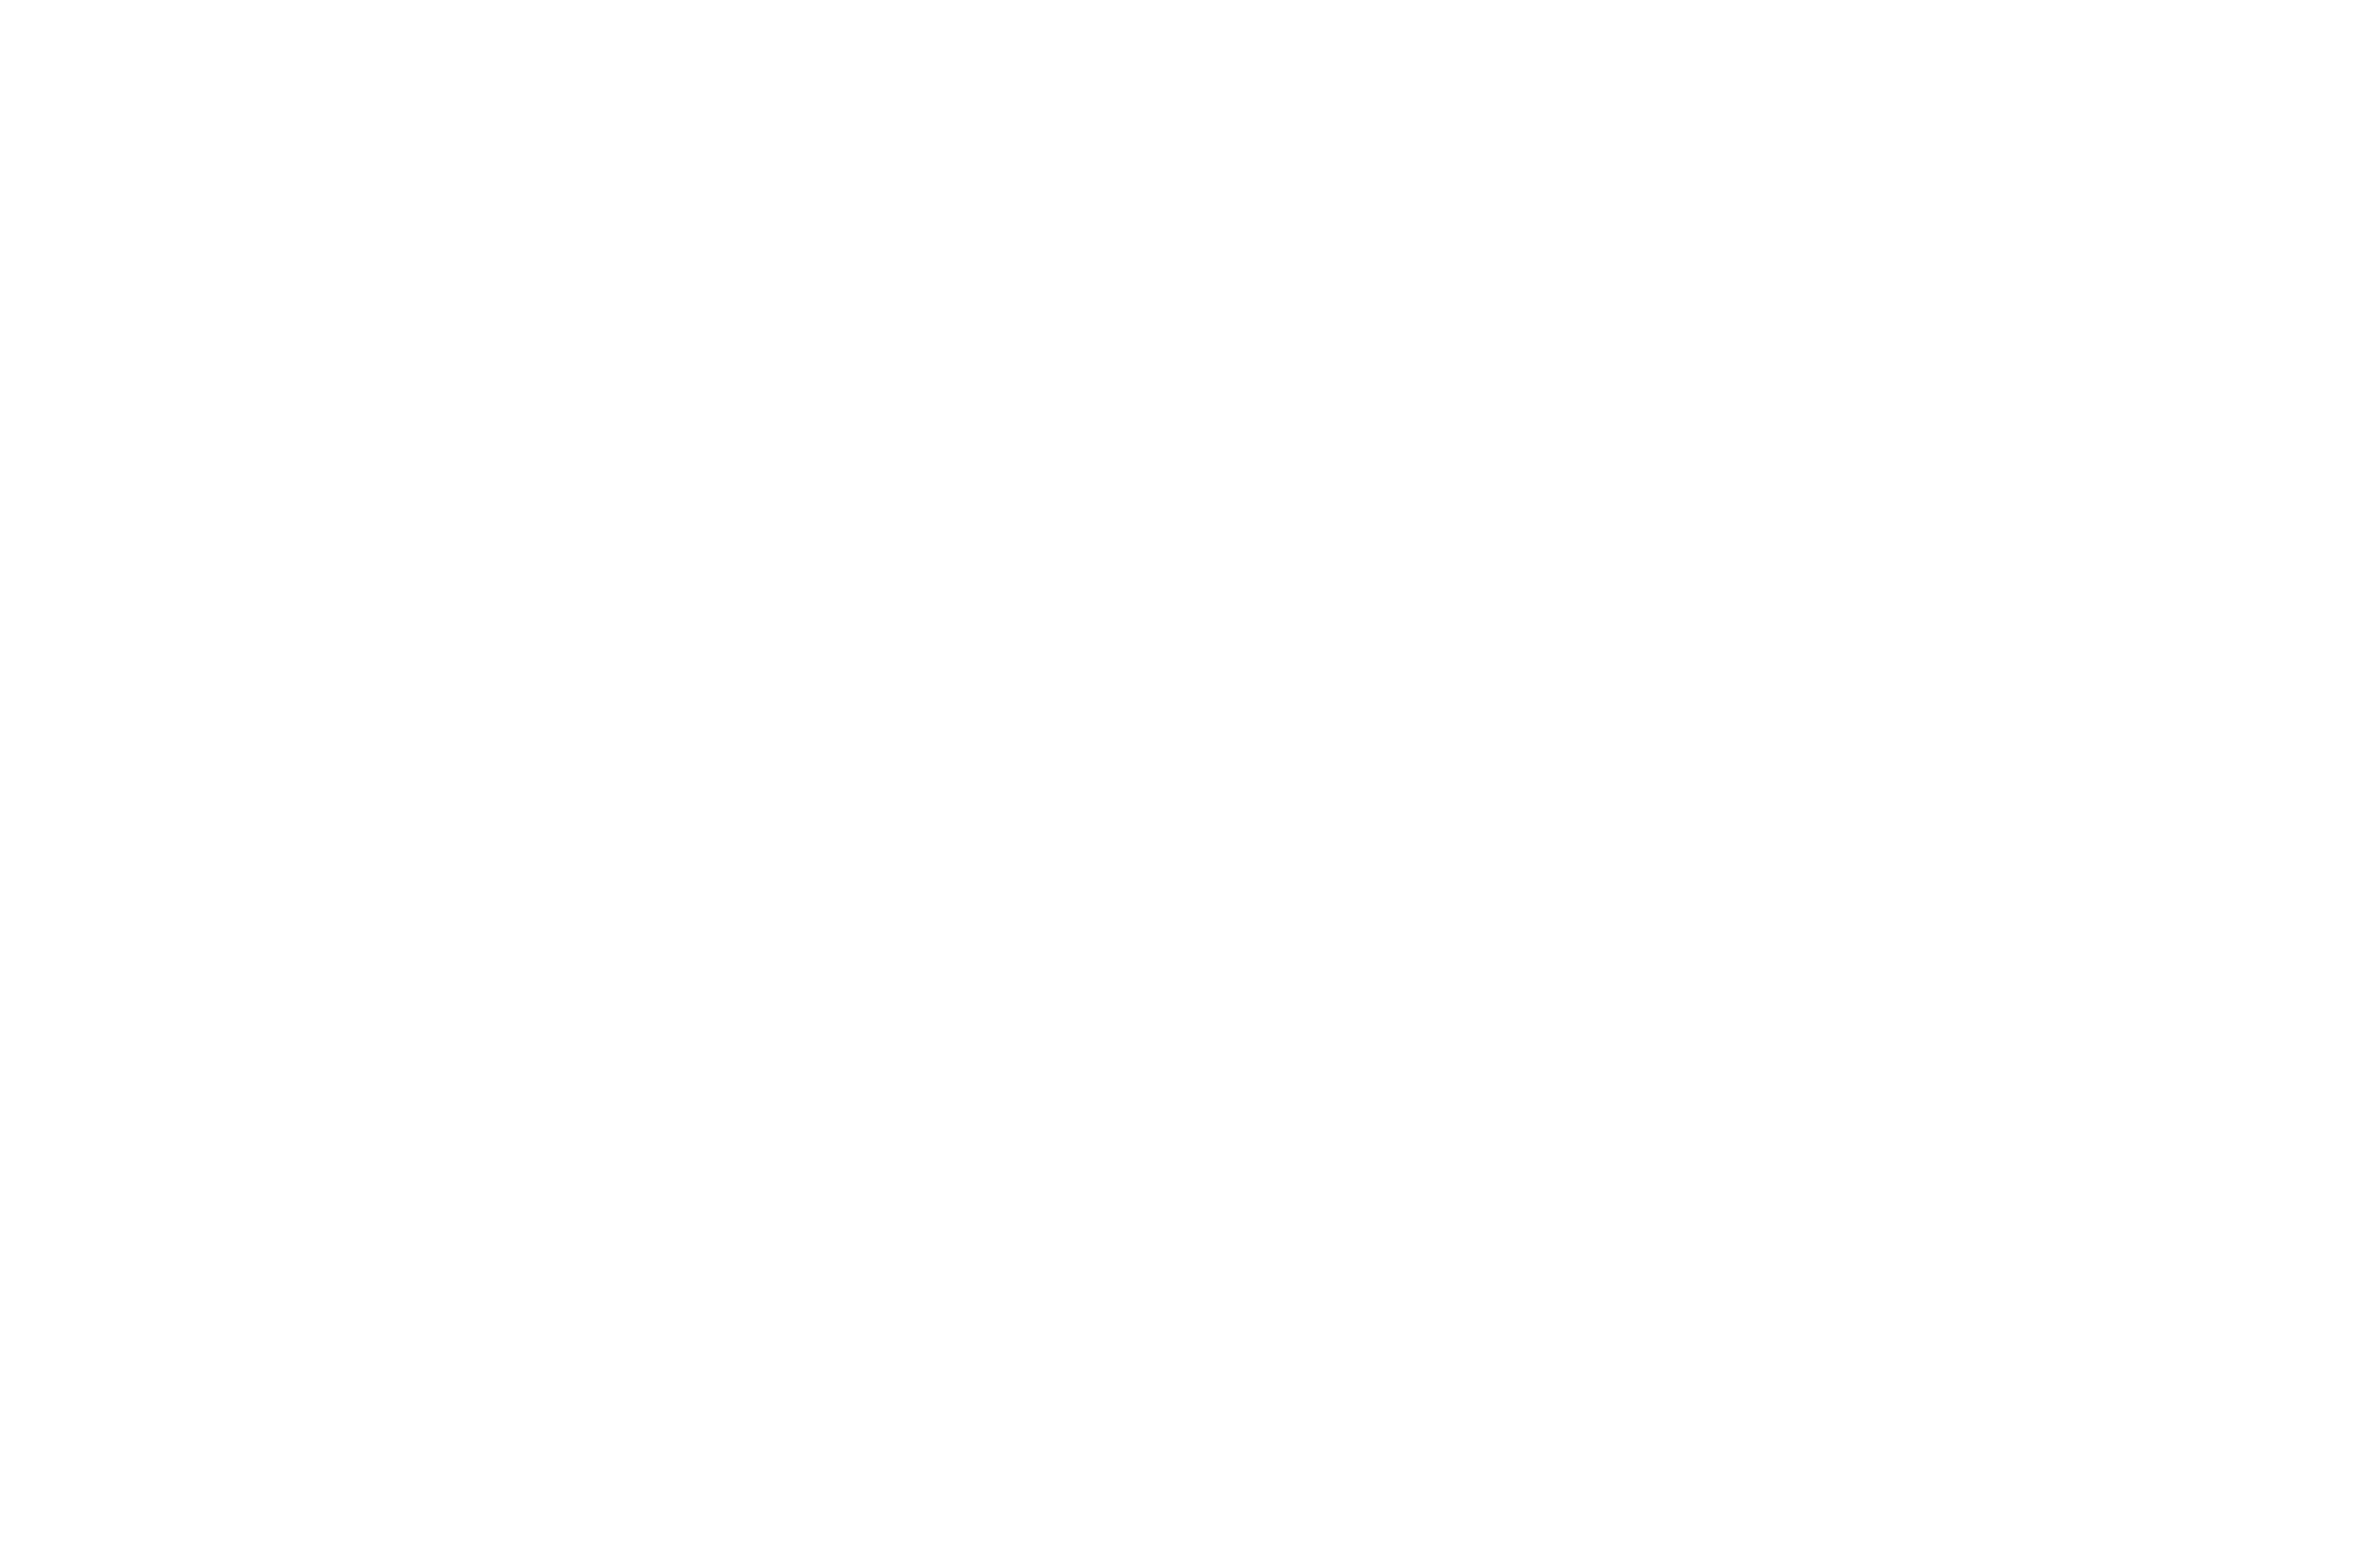 Oregon Short Film Festival 2019 | Best Director